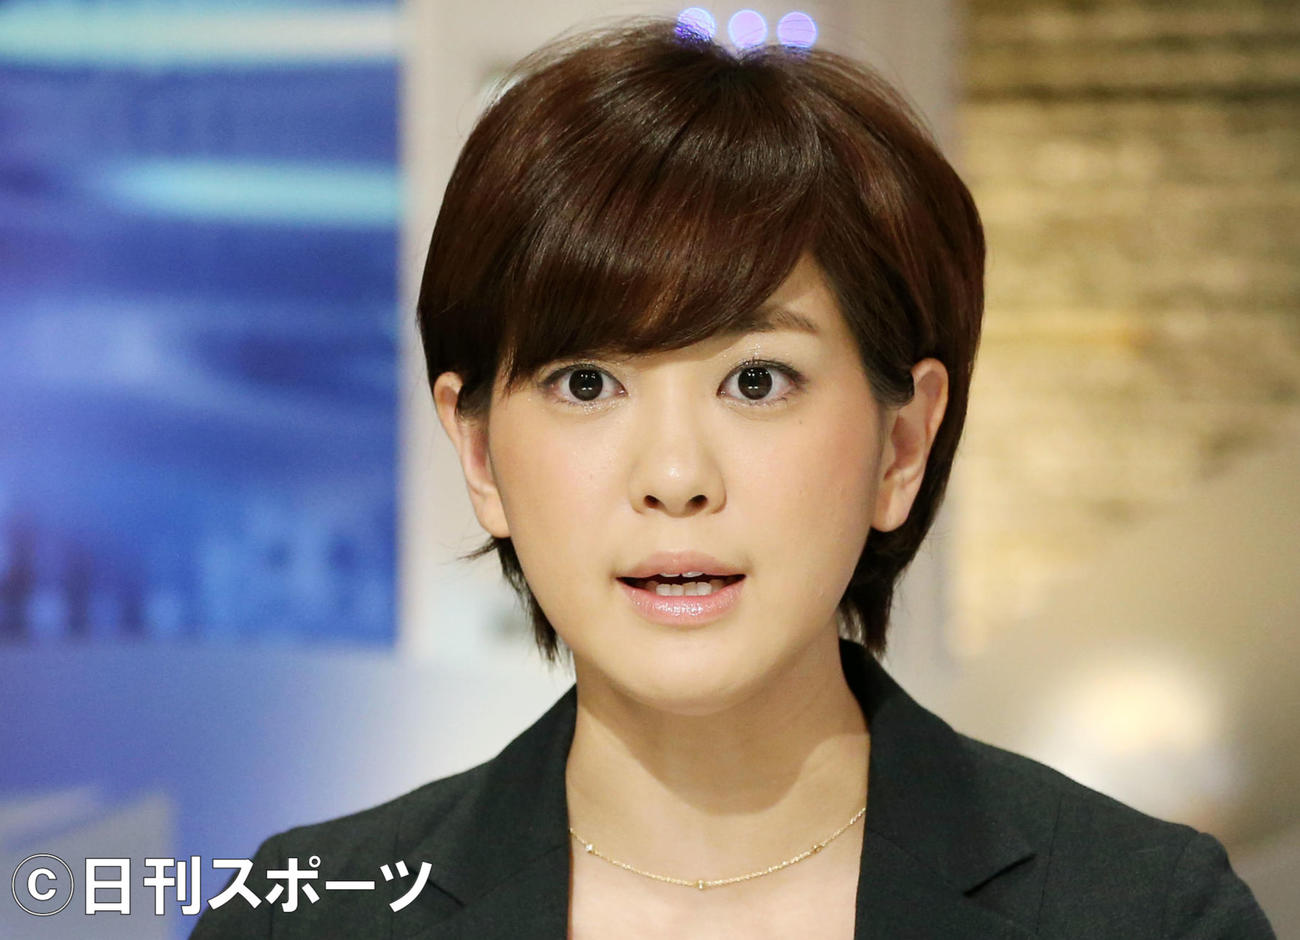 ABC塚本麻里衣アナウンサー(2013年11月26日撮影)